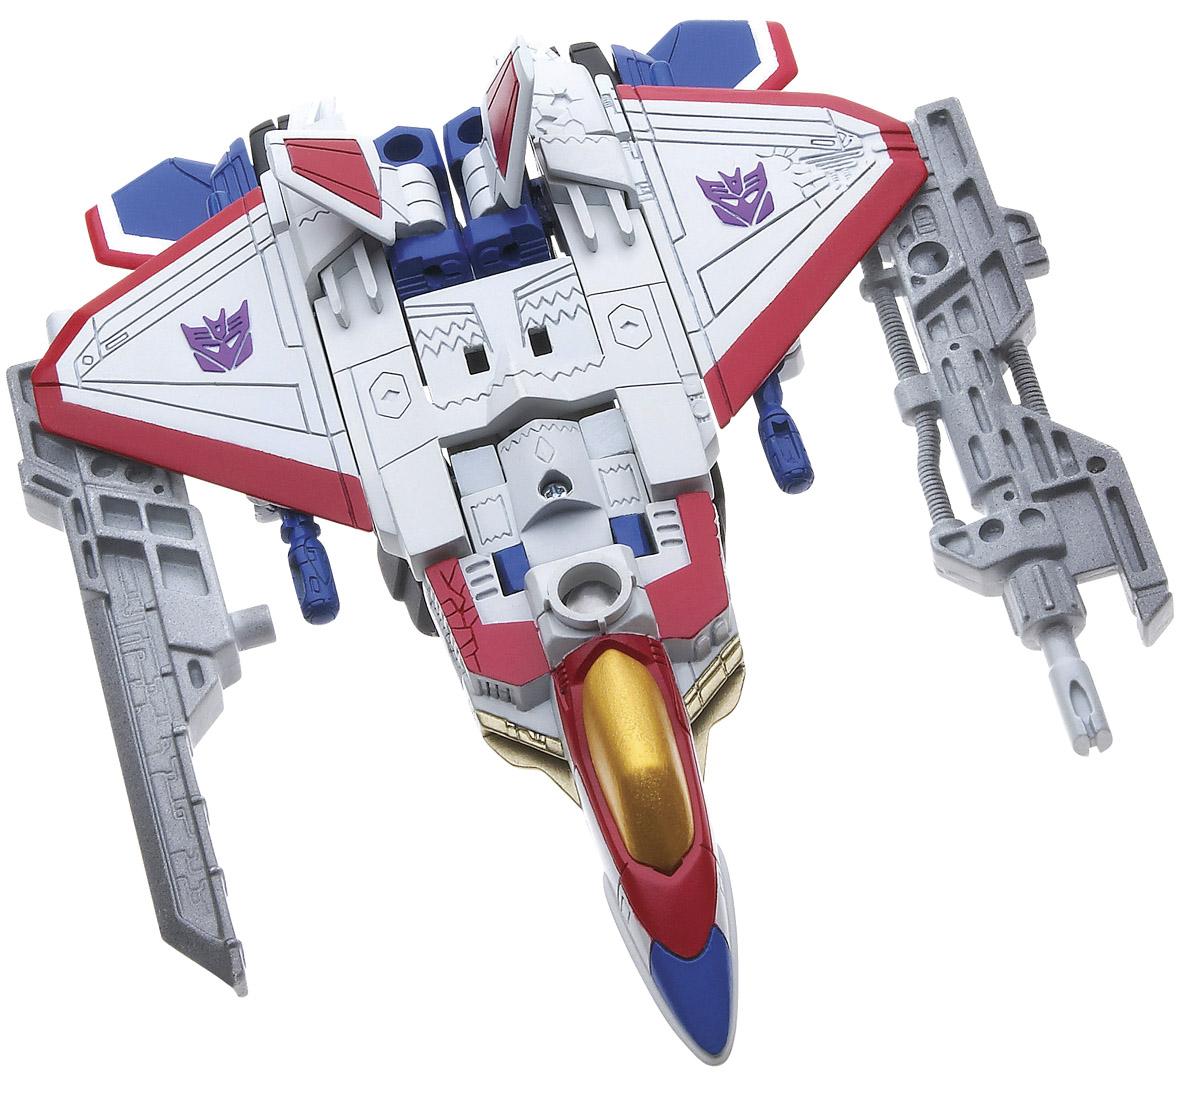 Starscream  Energon  Images Transformers Energon Starscream